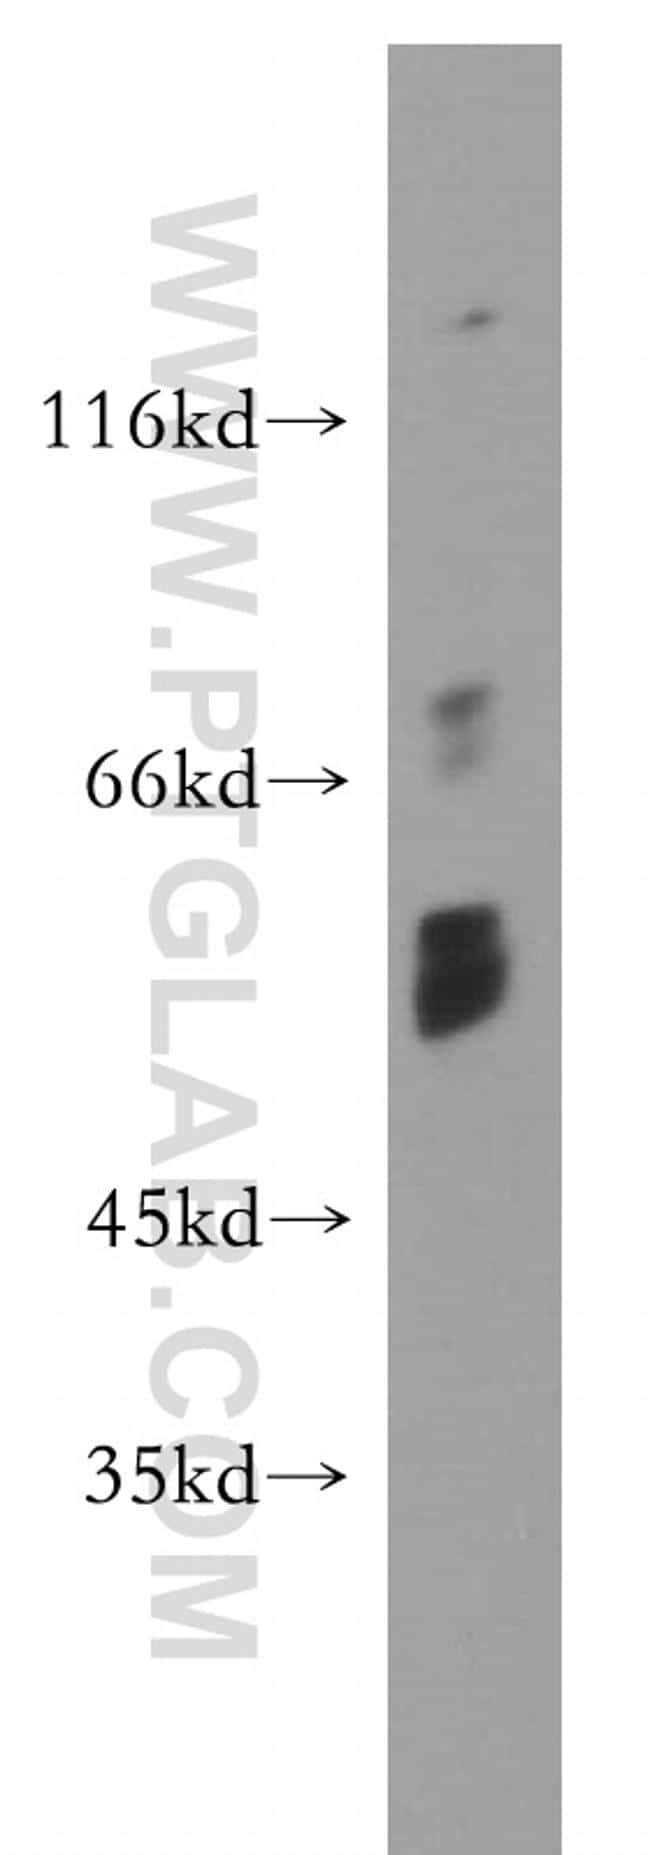 Choline kinase alpha Antibody in Western Blot (WB)